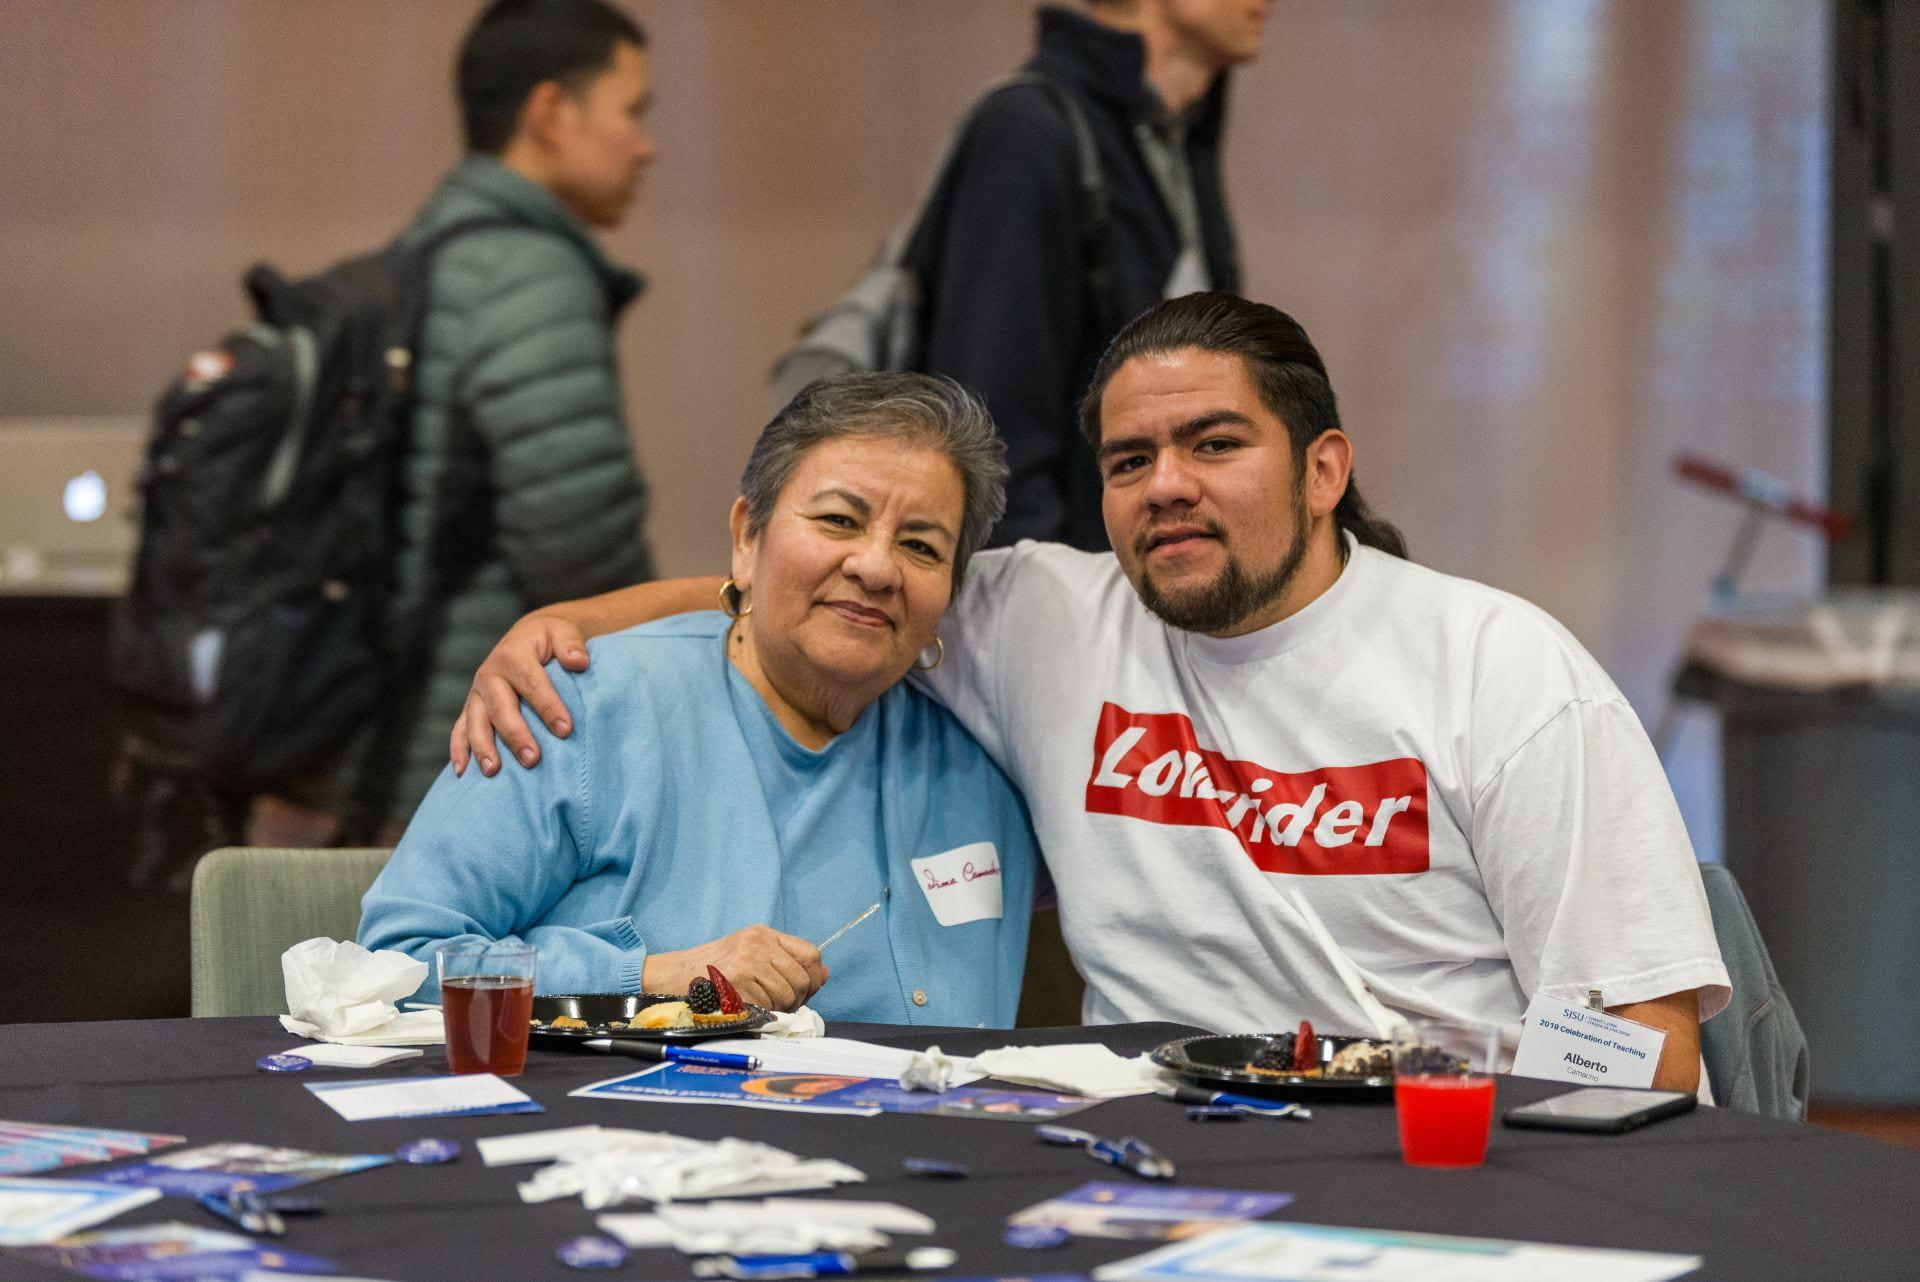 Alberto Camacho with his mother Irma.